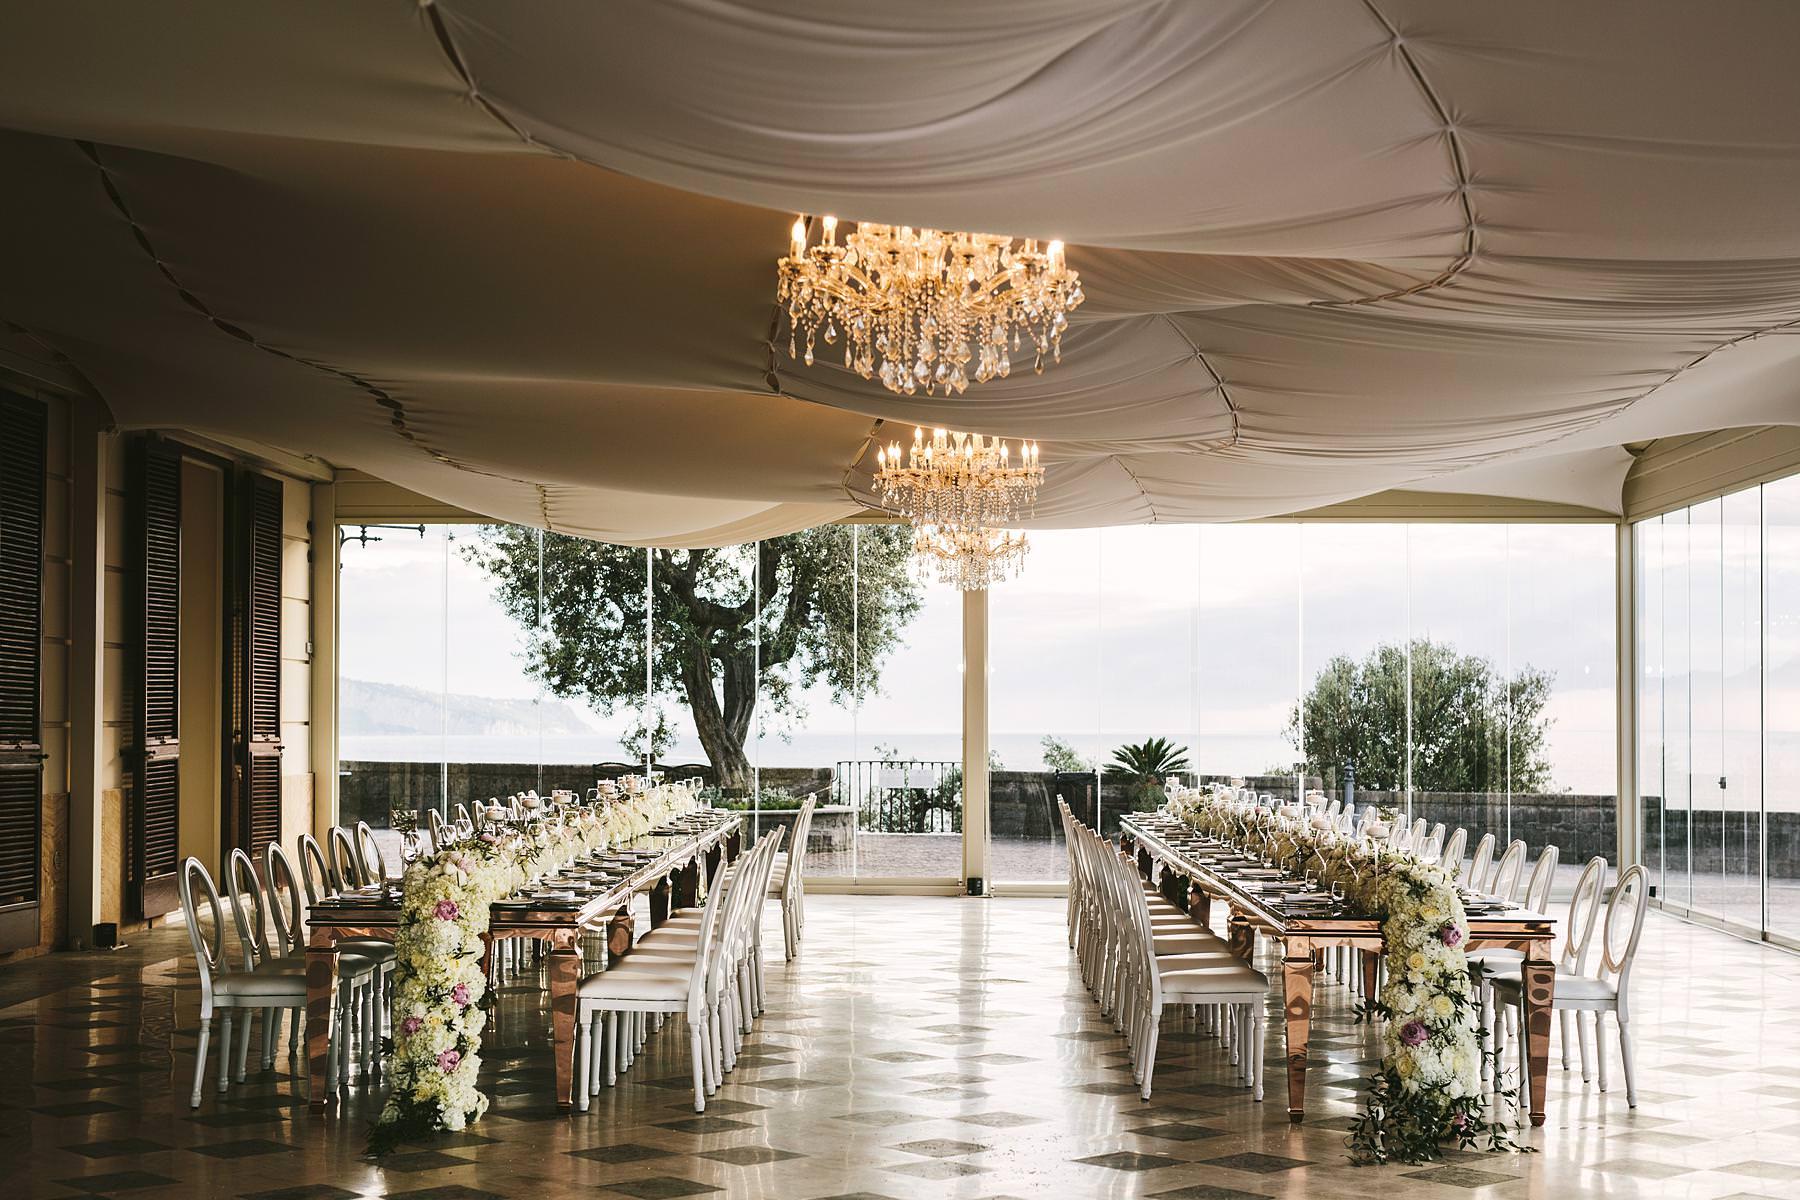 Very elegant and beautiful destination wedding dinner decor in Villa Angelina, Sorrento